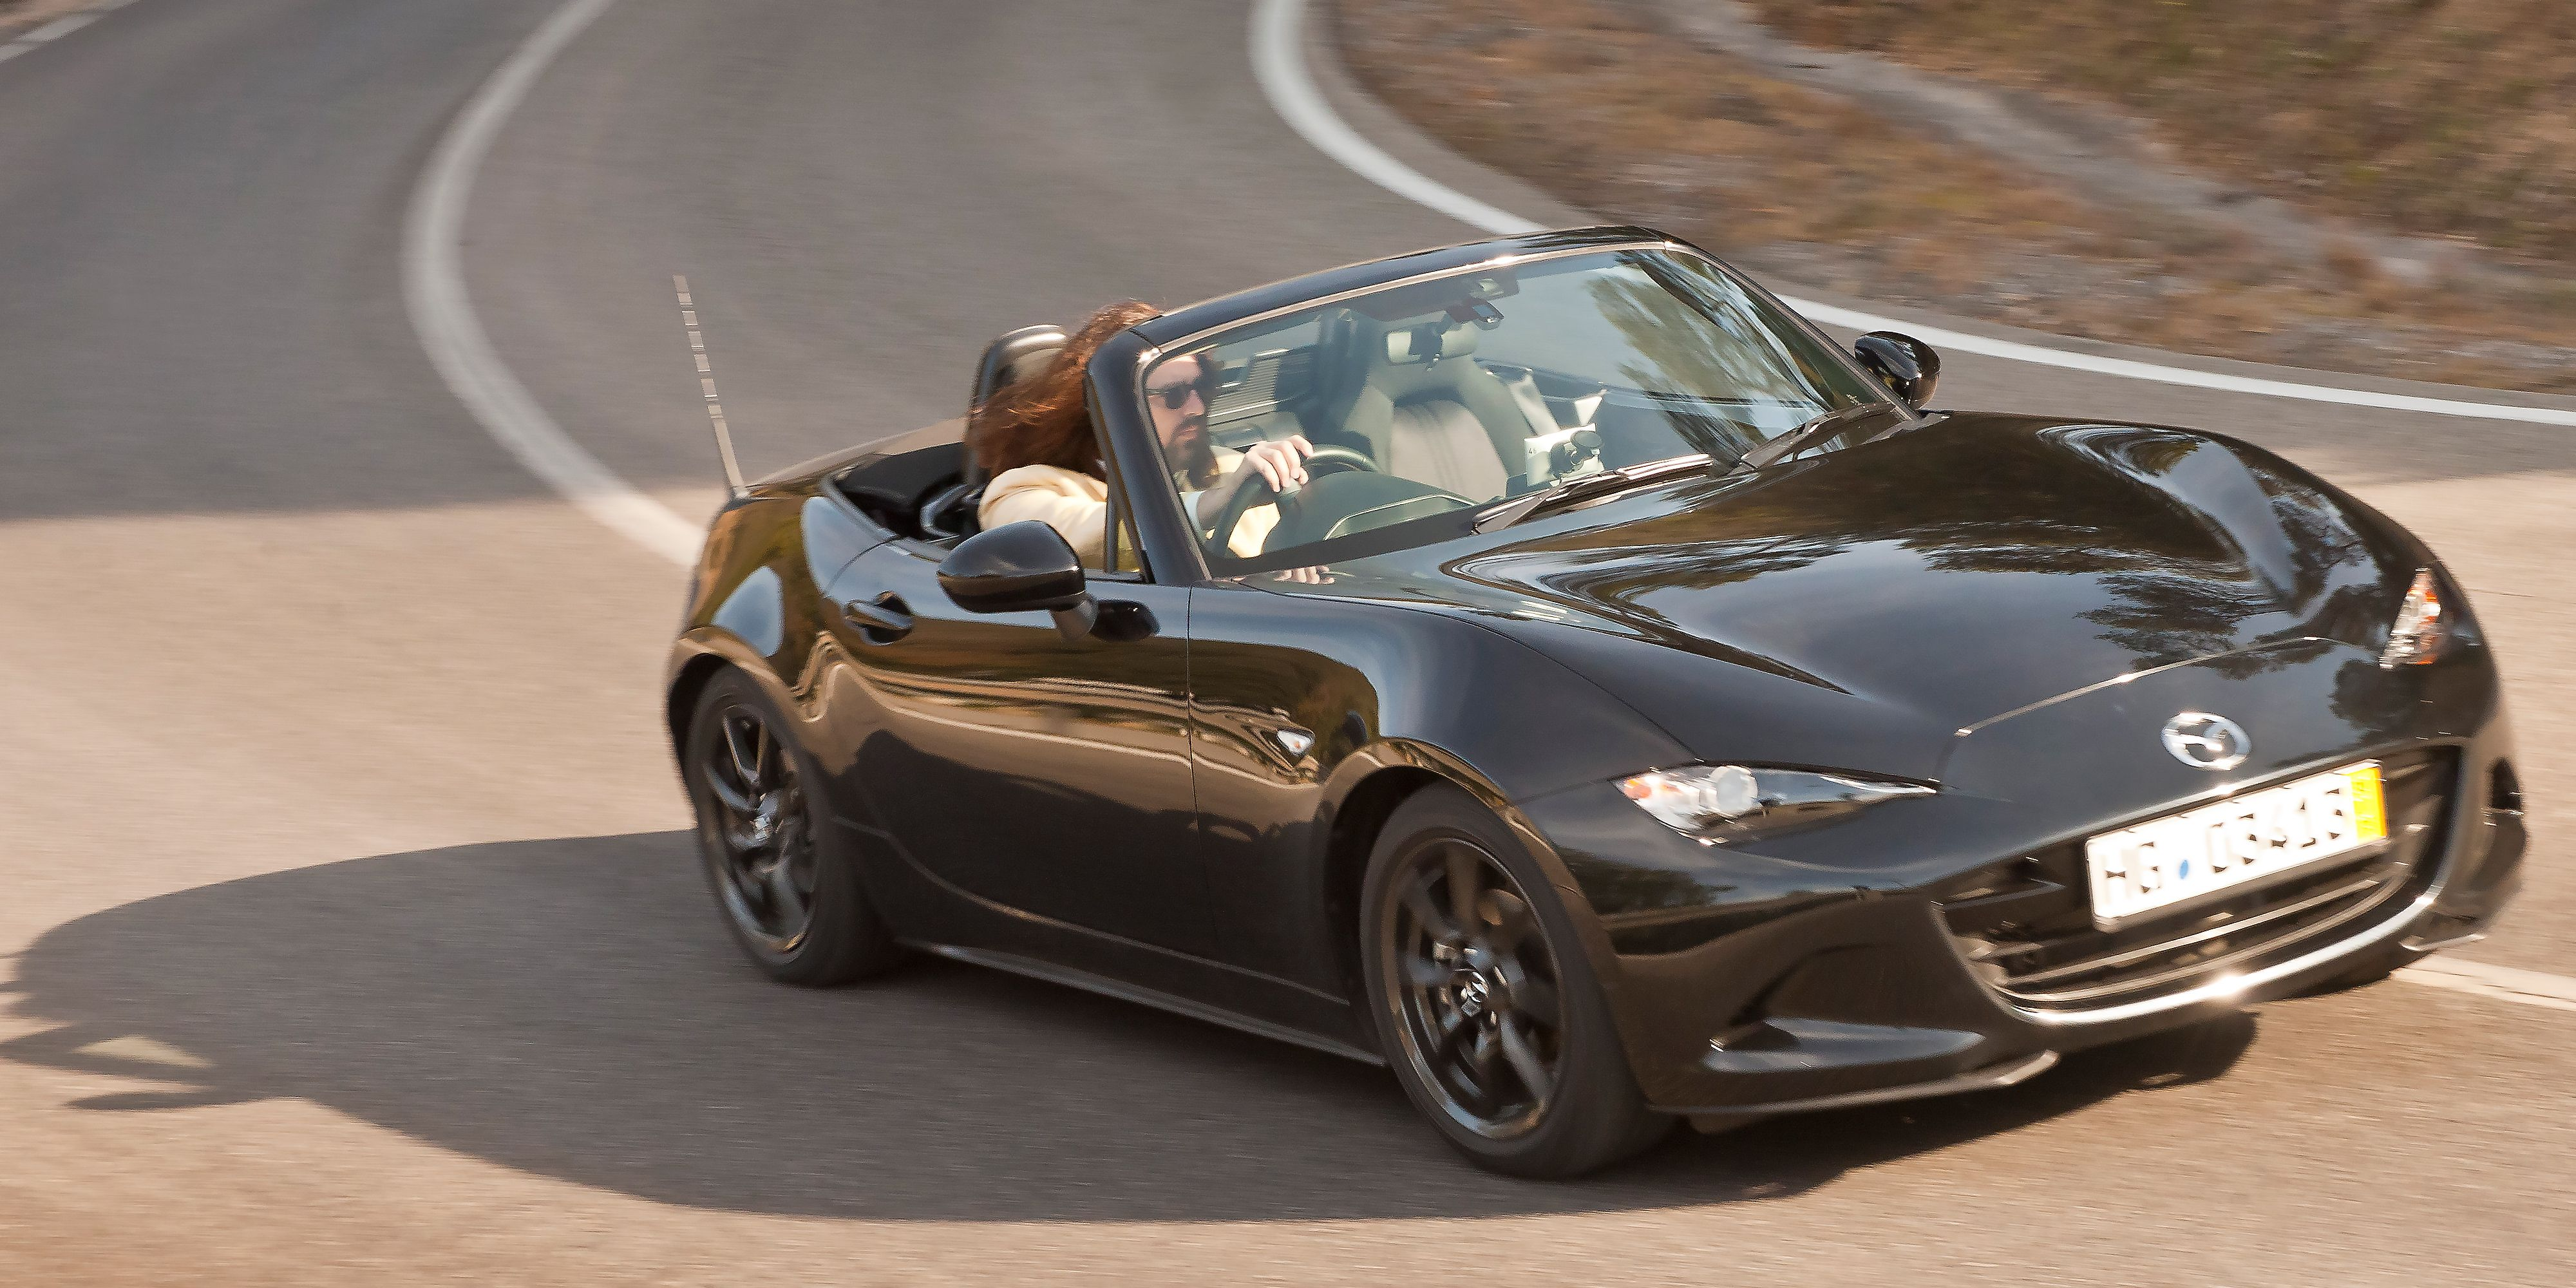 First Drive: 2016 Mazda MX-5 Miata